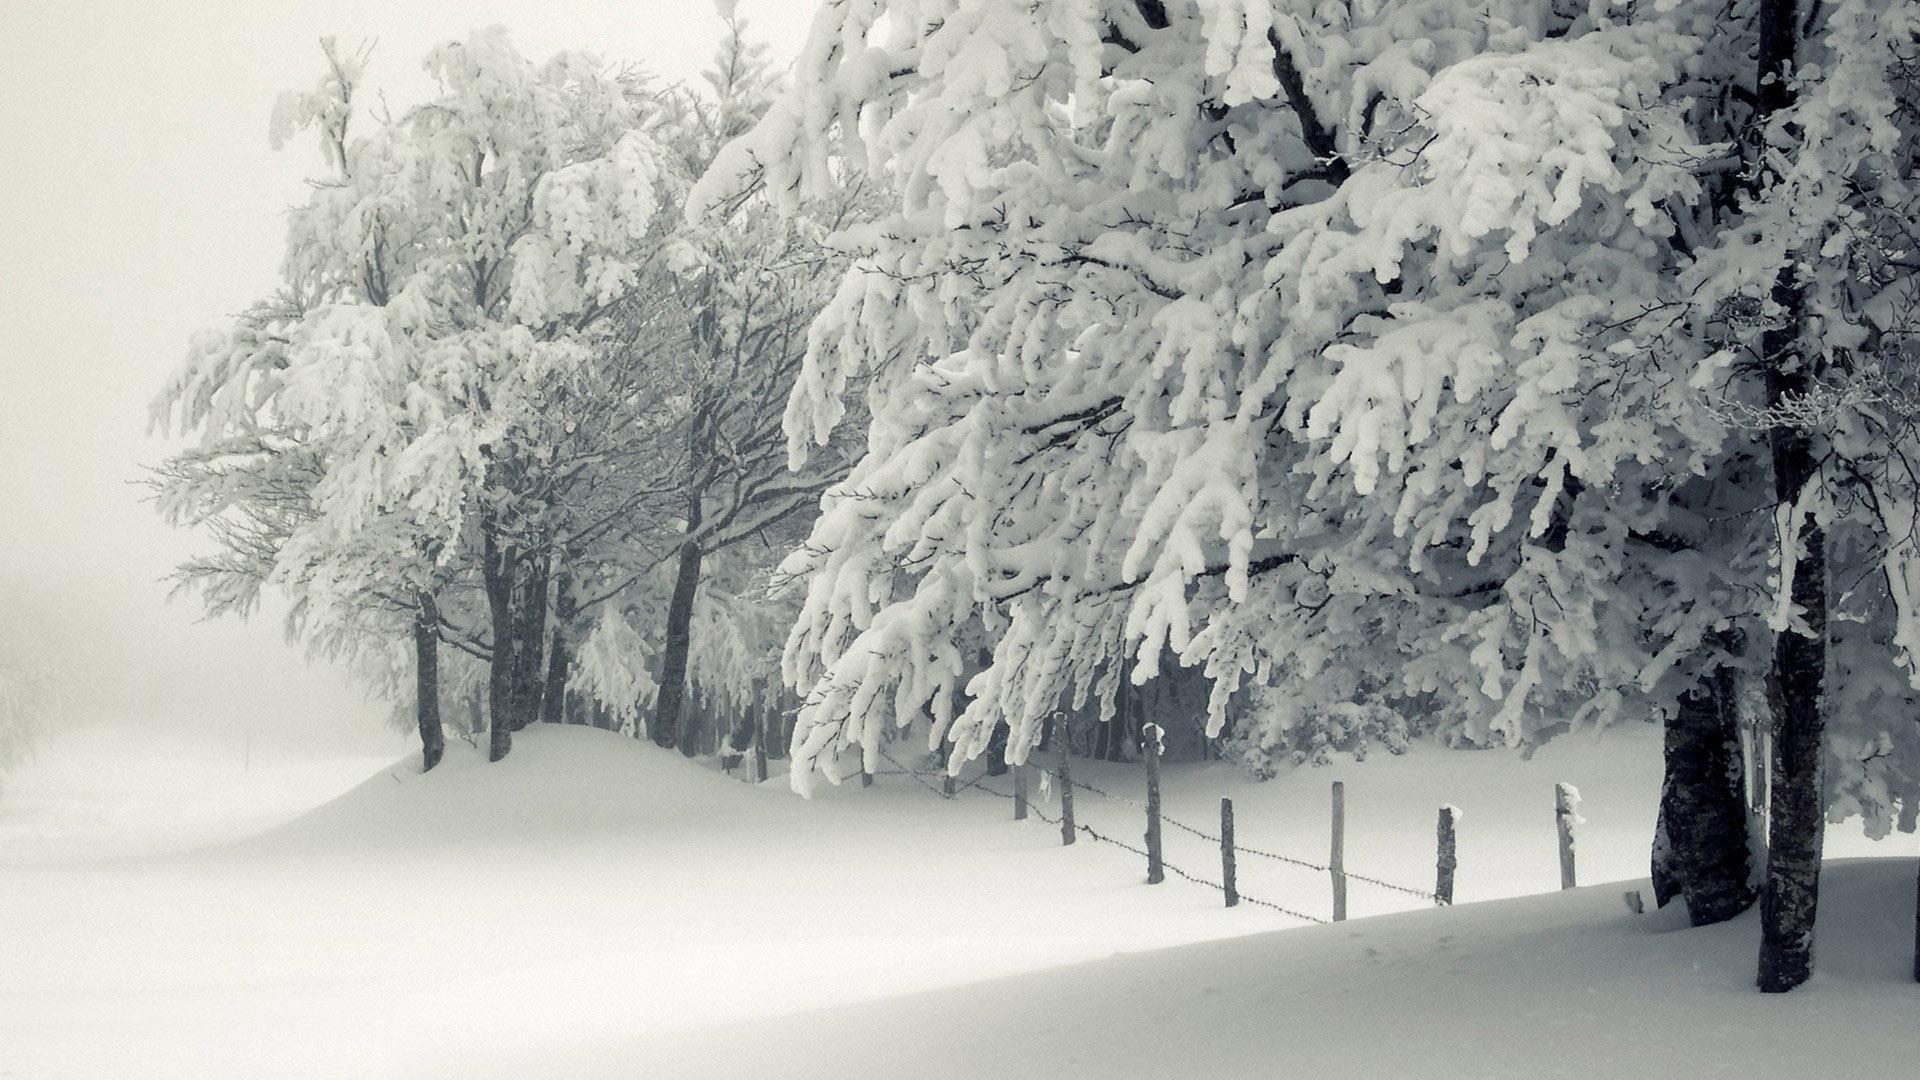 Lovely Snowy Trees Wallpaper